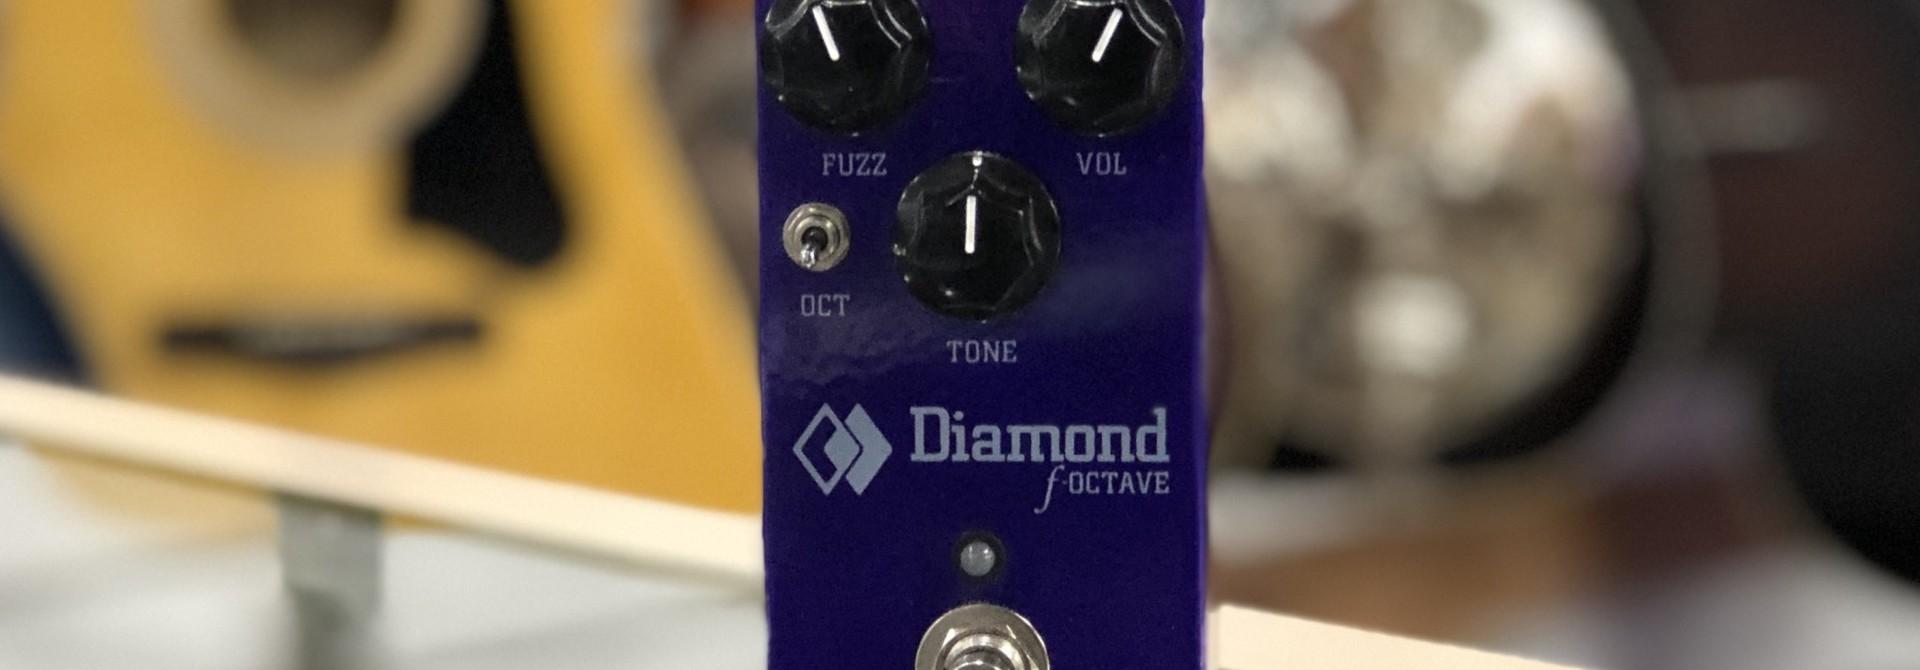 Diamond F-Octave Fuzz